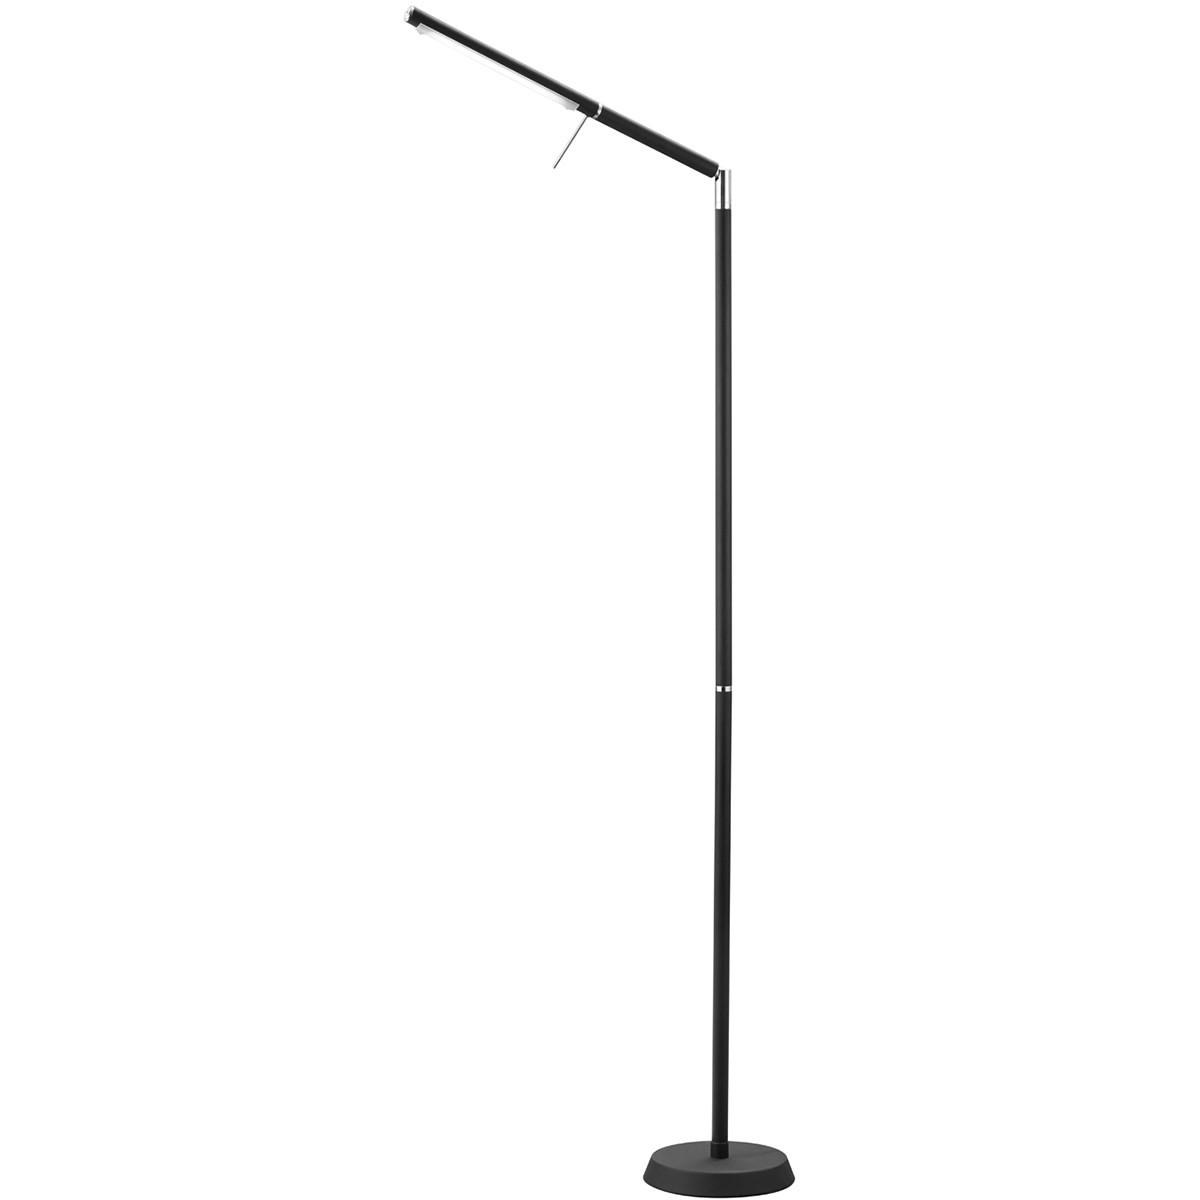 LED Vloerlamp - Trion Filiga - 6W - Warm Wit 3000K - 1-lichts - Dimbaar - Rond - Mat Zwart - Alumini